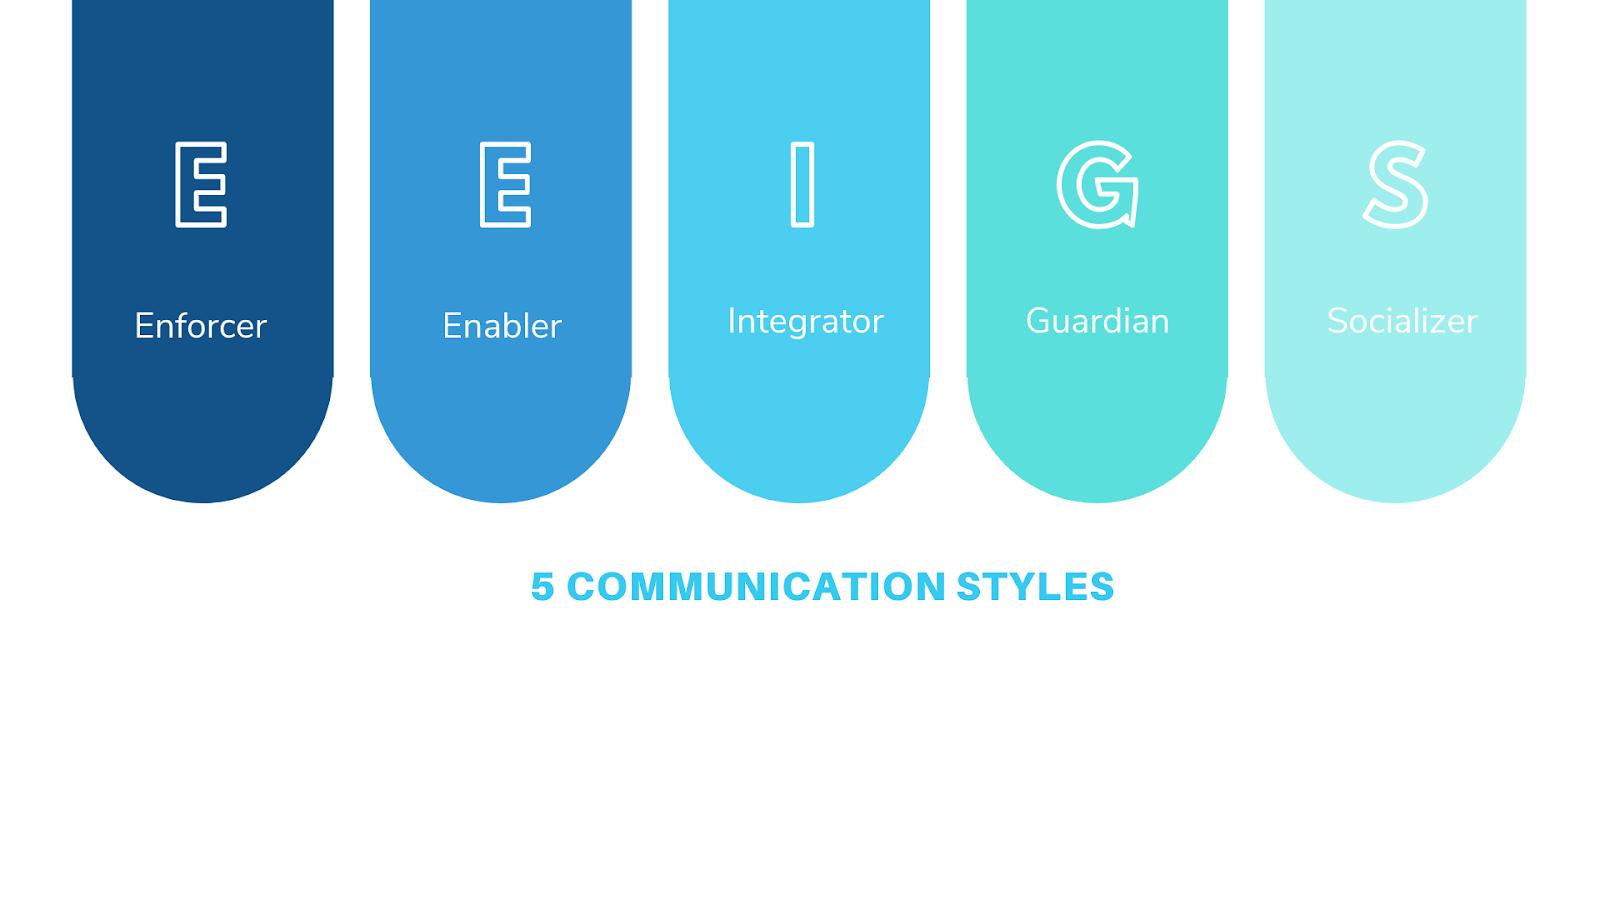 5 communication styles